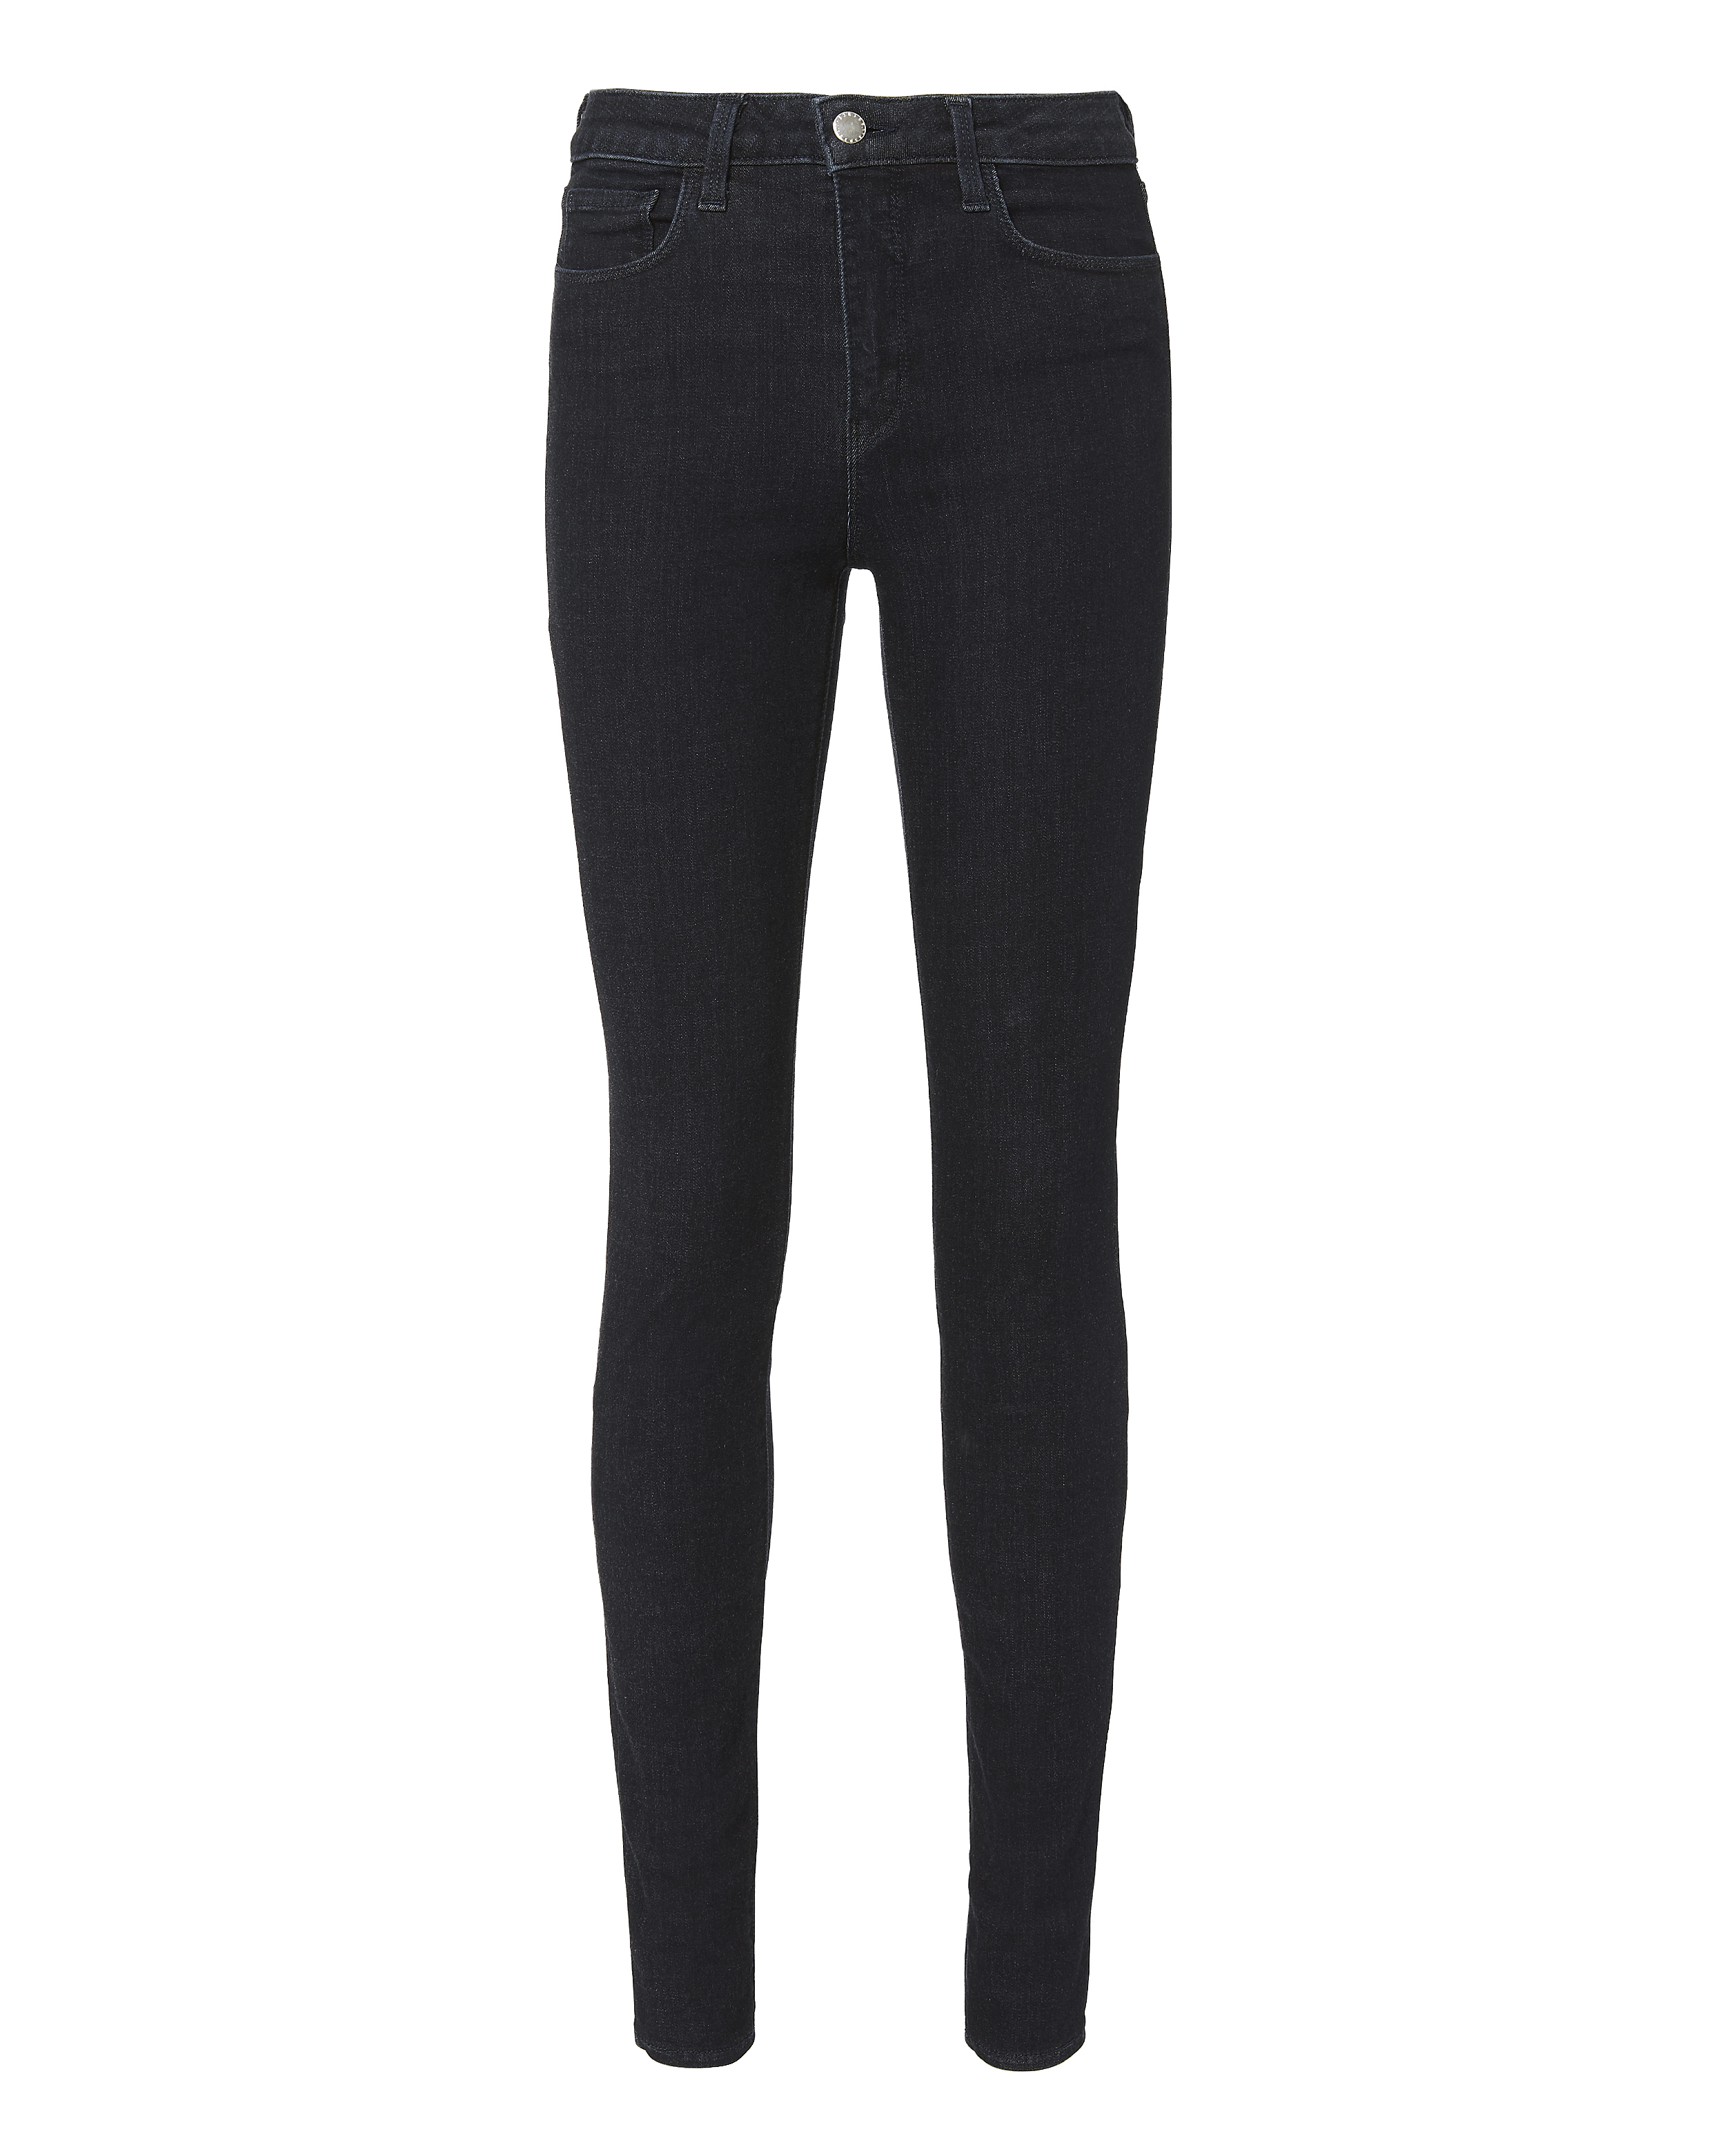 Marguerite High-Rise Eclipse Skinny Jeans Denim, Navy